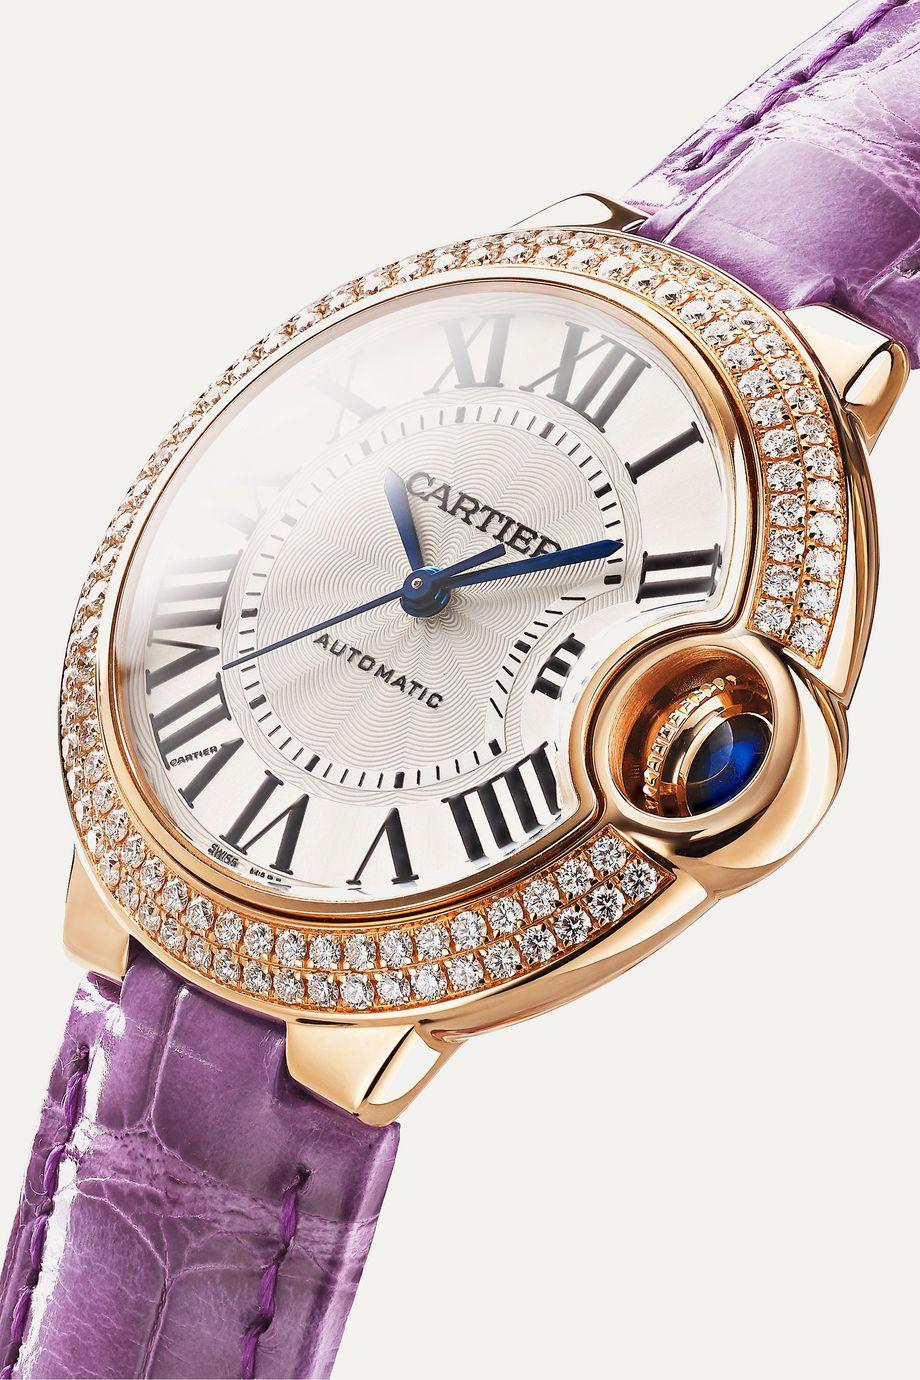 Cartier Ballon Bleu de Cartier 33 毫米 18K 玫瑰金钻石腕表(短吻鳄鱼皮表带)